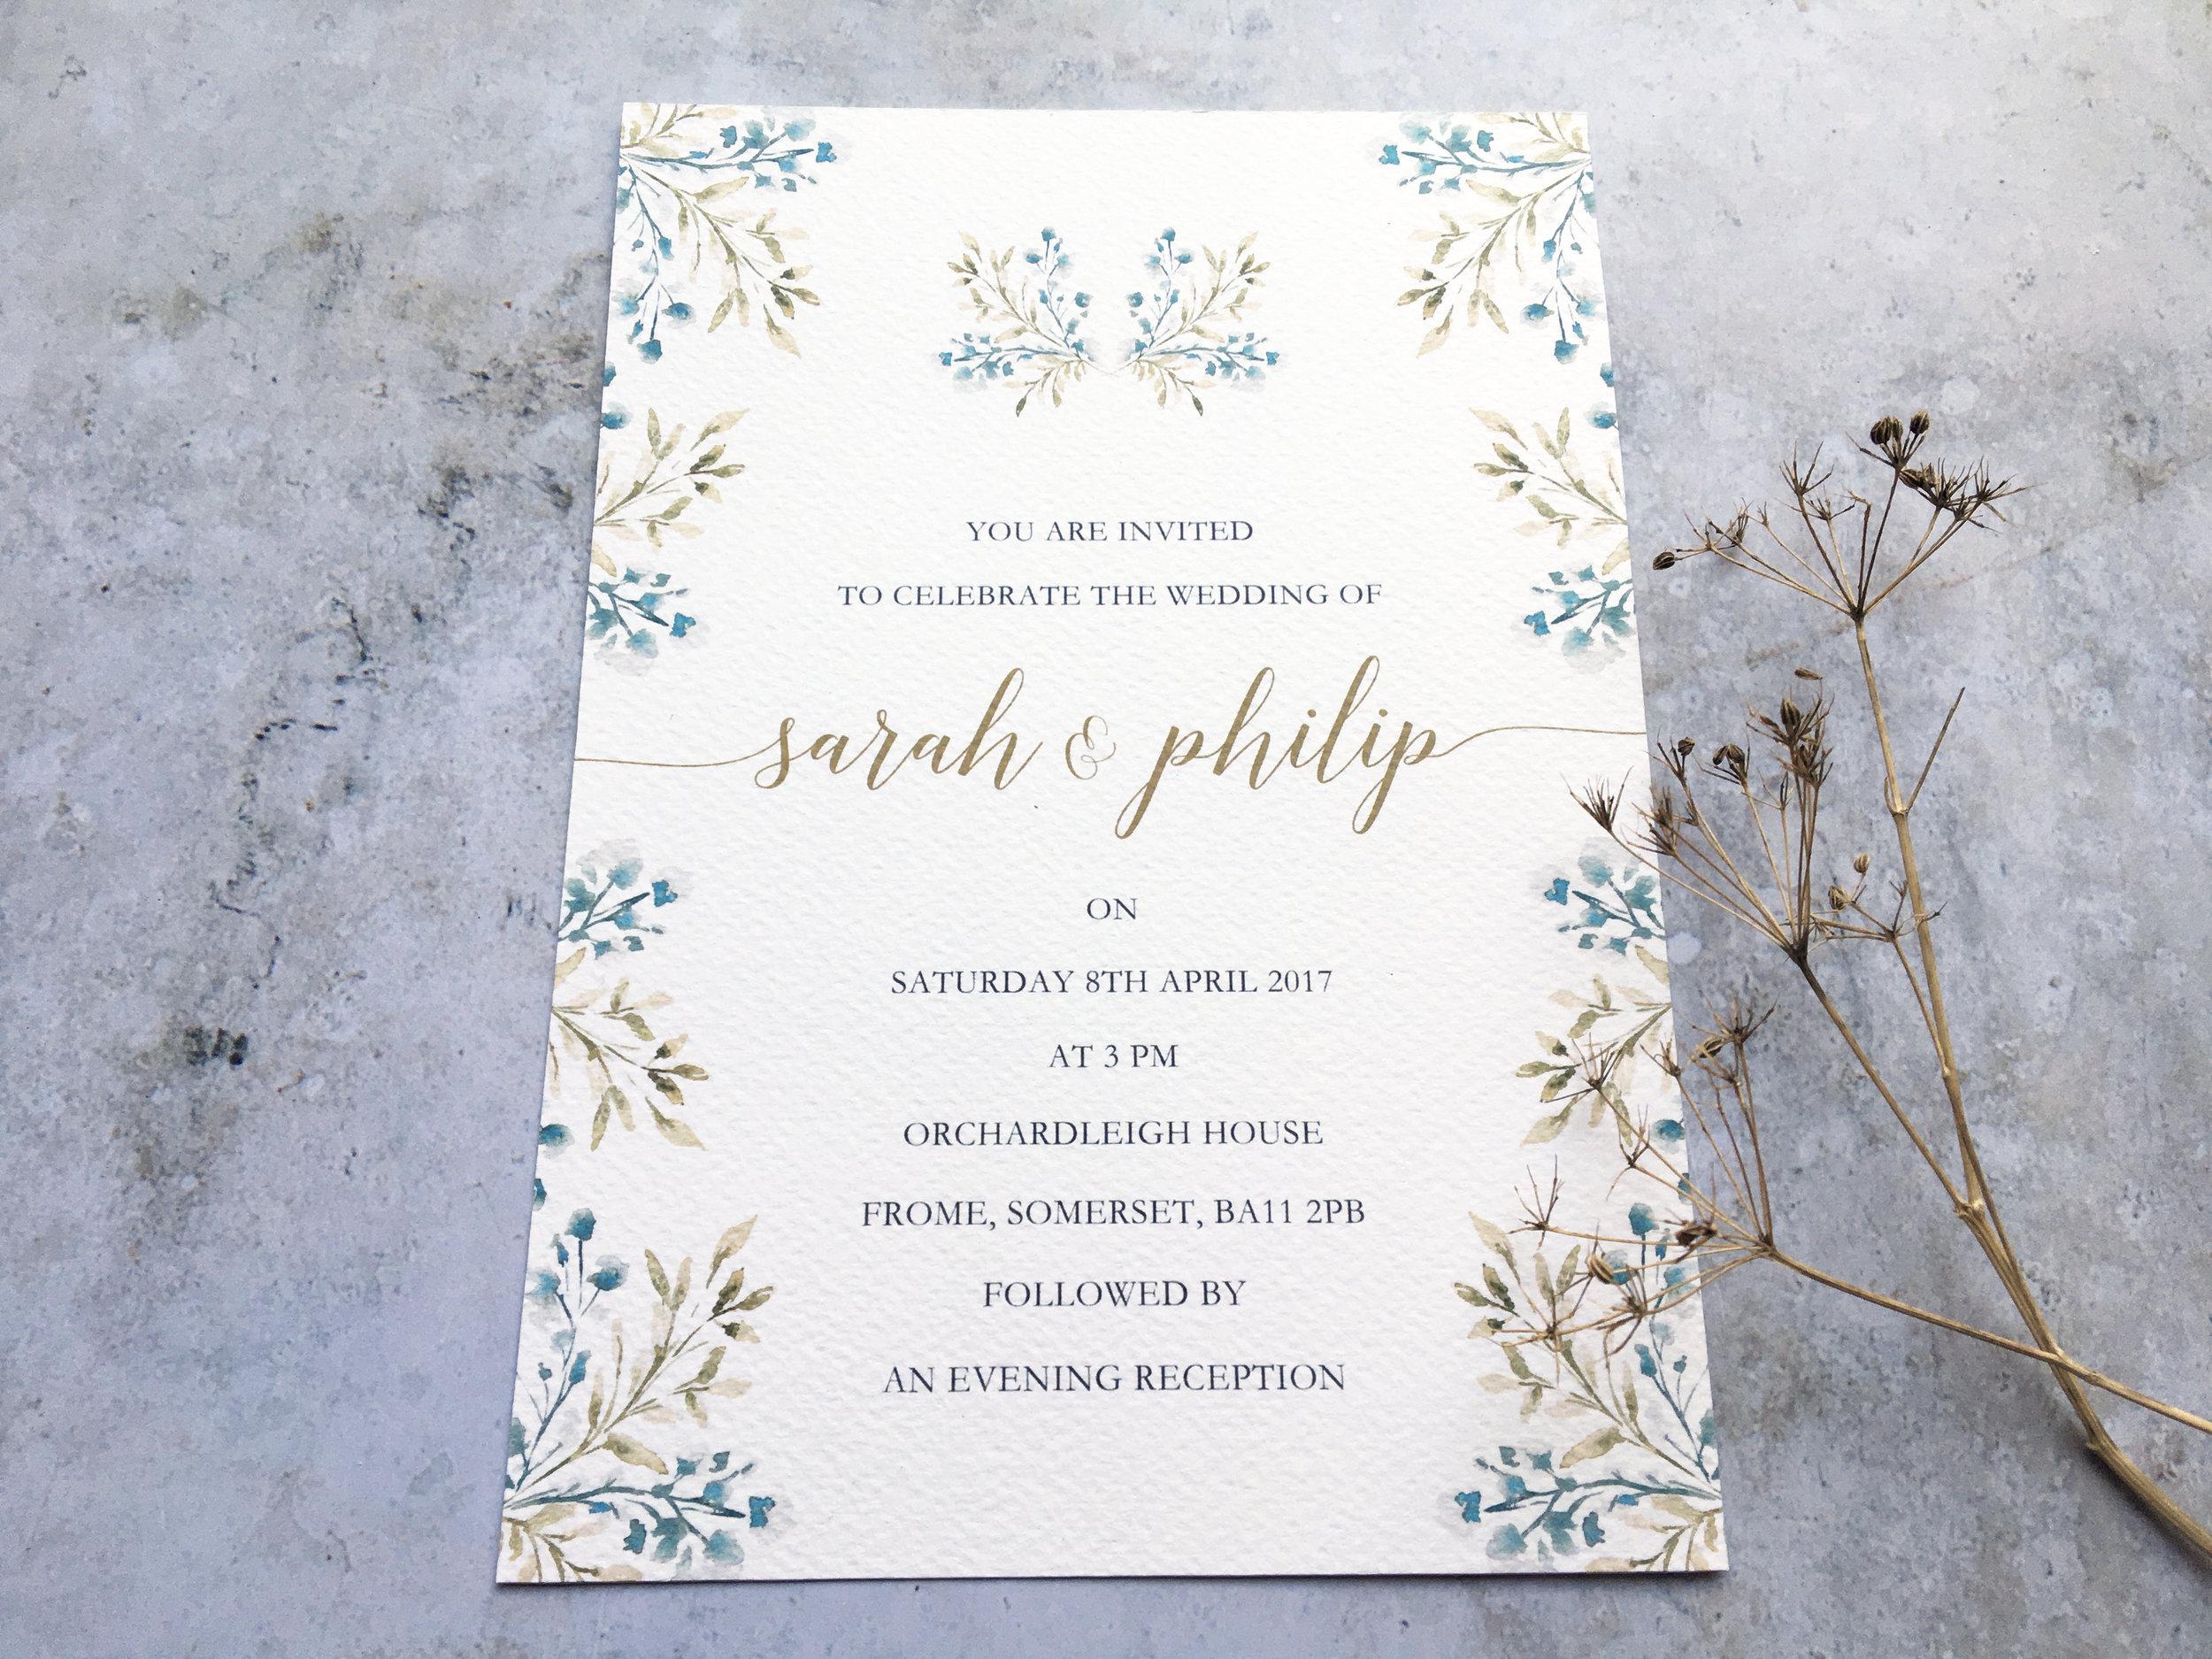 Enchanted invite.jpg